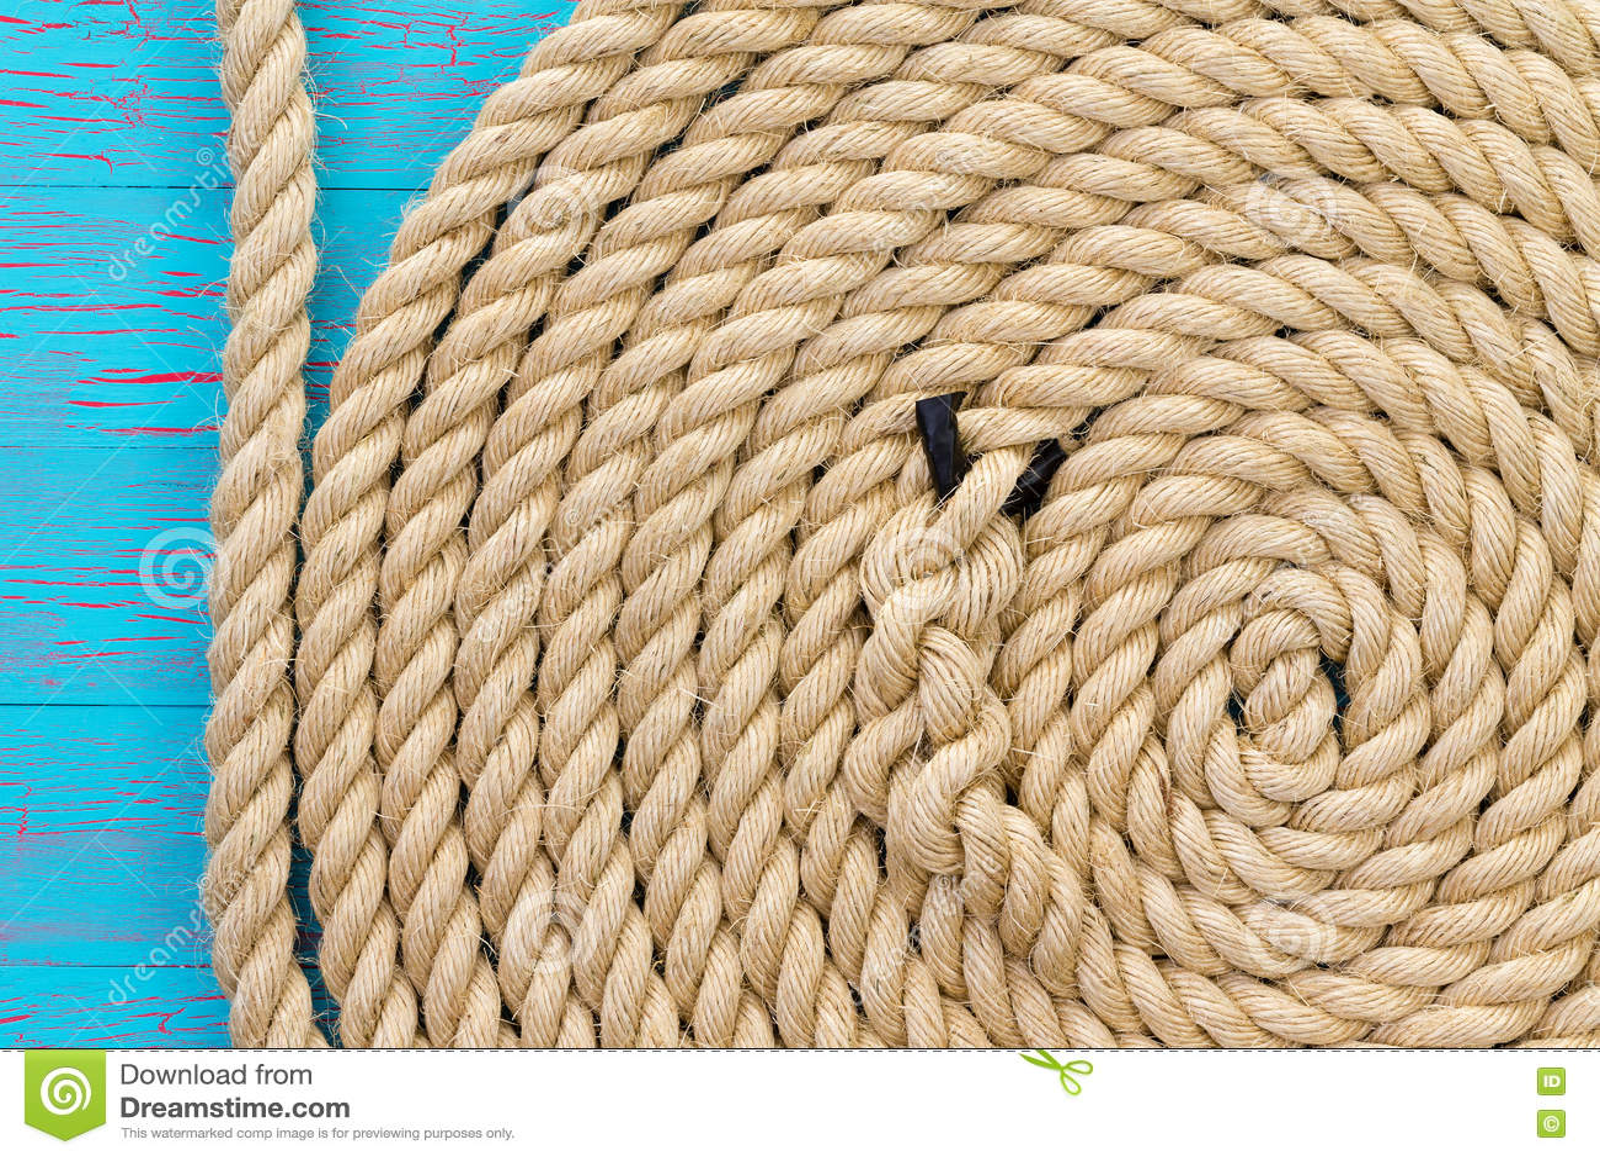 Dikke kabel in beëindigd in spiraalvormige vorm